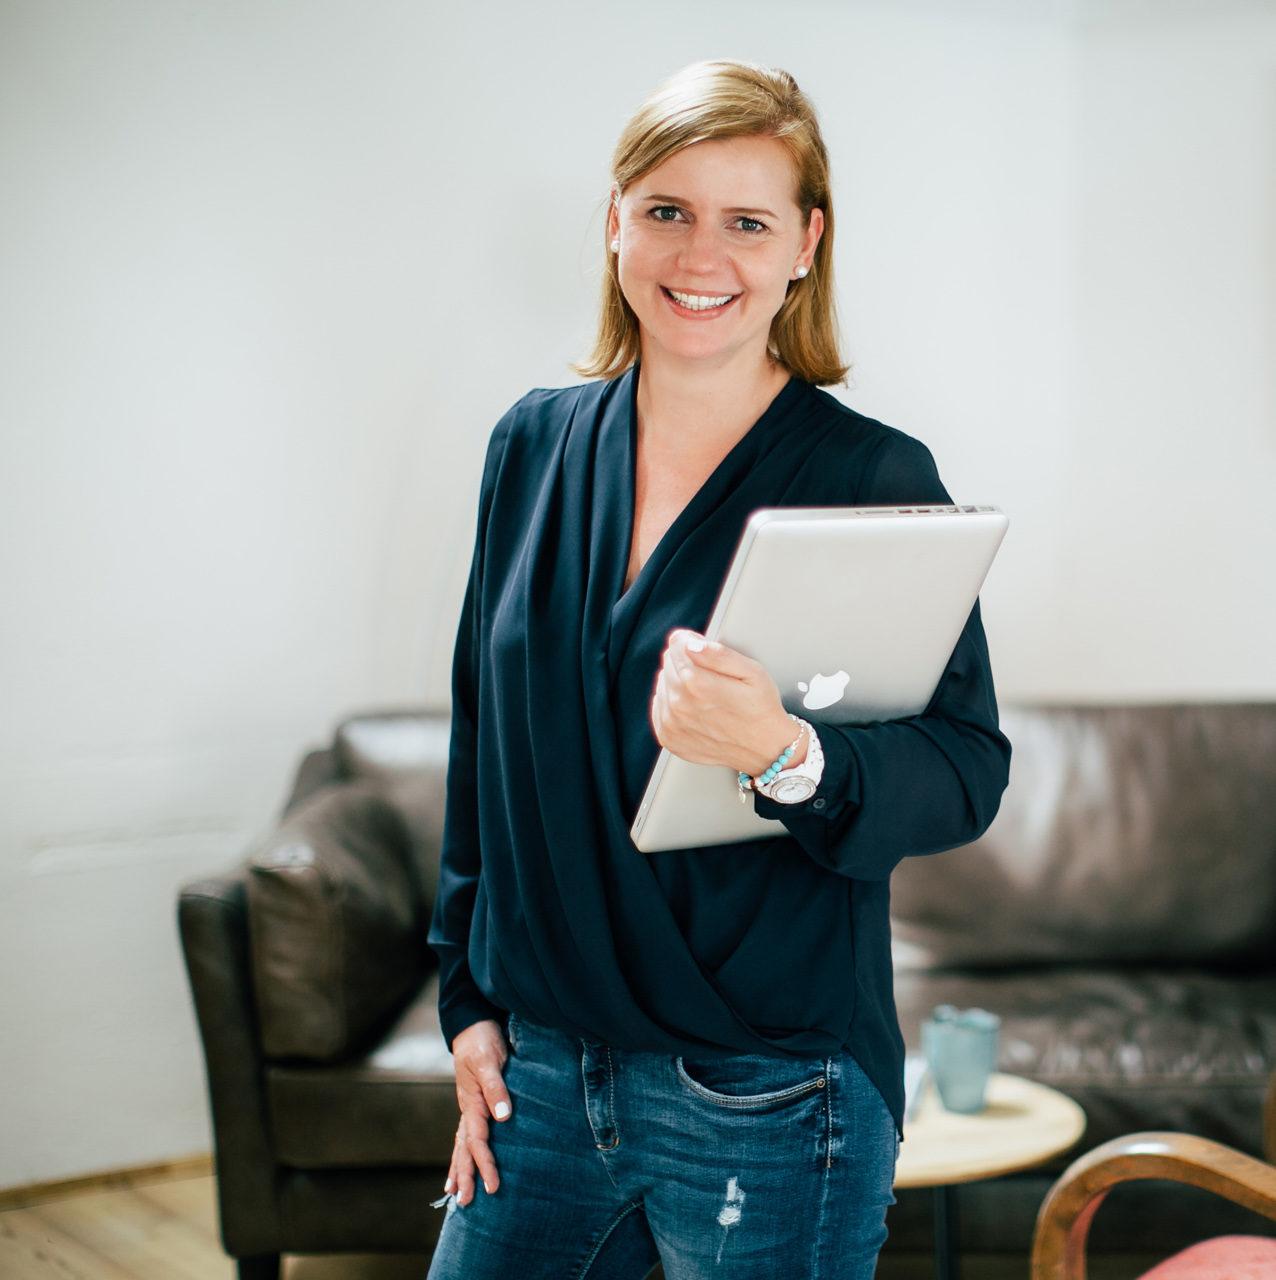 Stefanie Kneisz - People - Business - Laptop